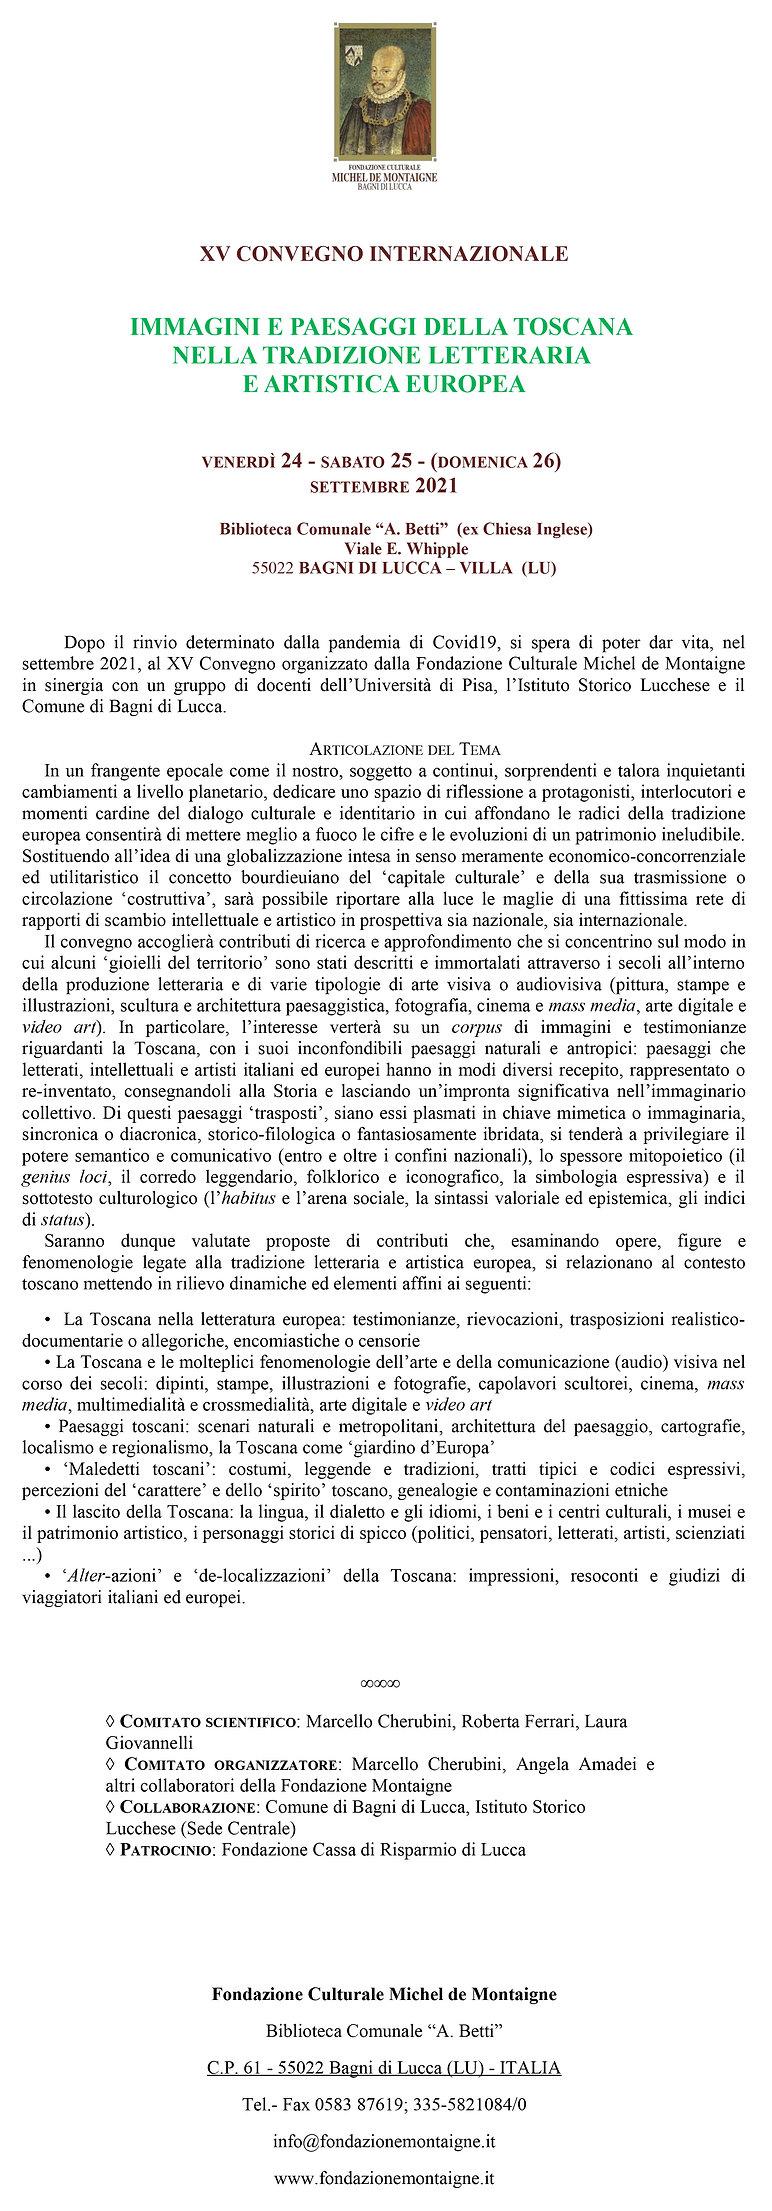 2021 Bagni Convegno-1.jpg